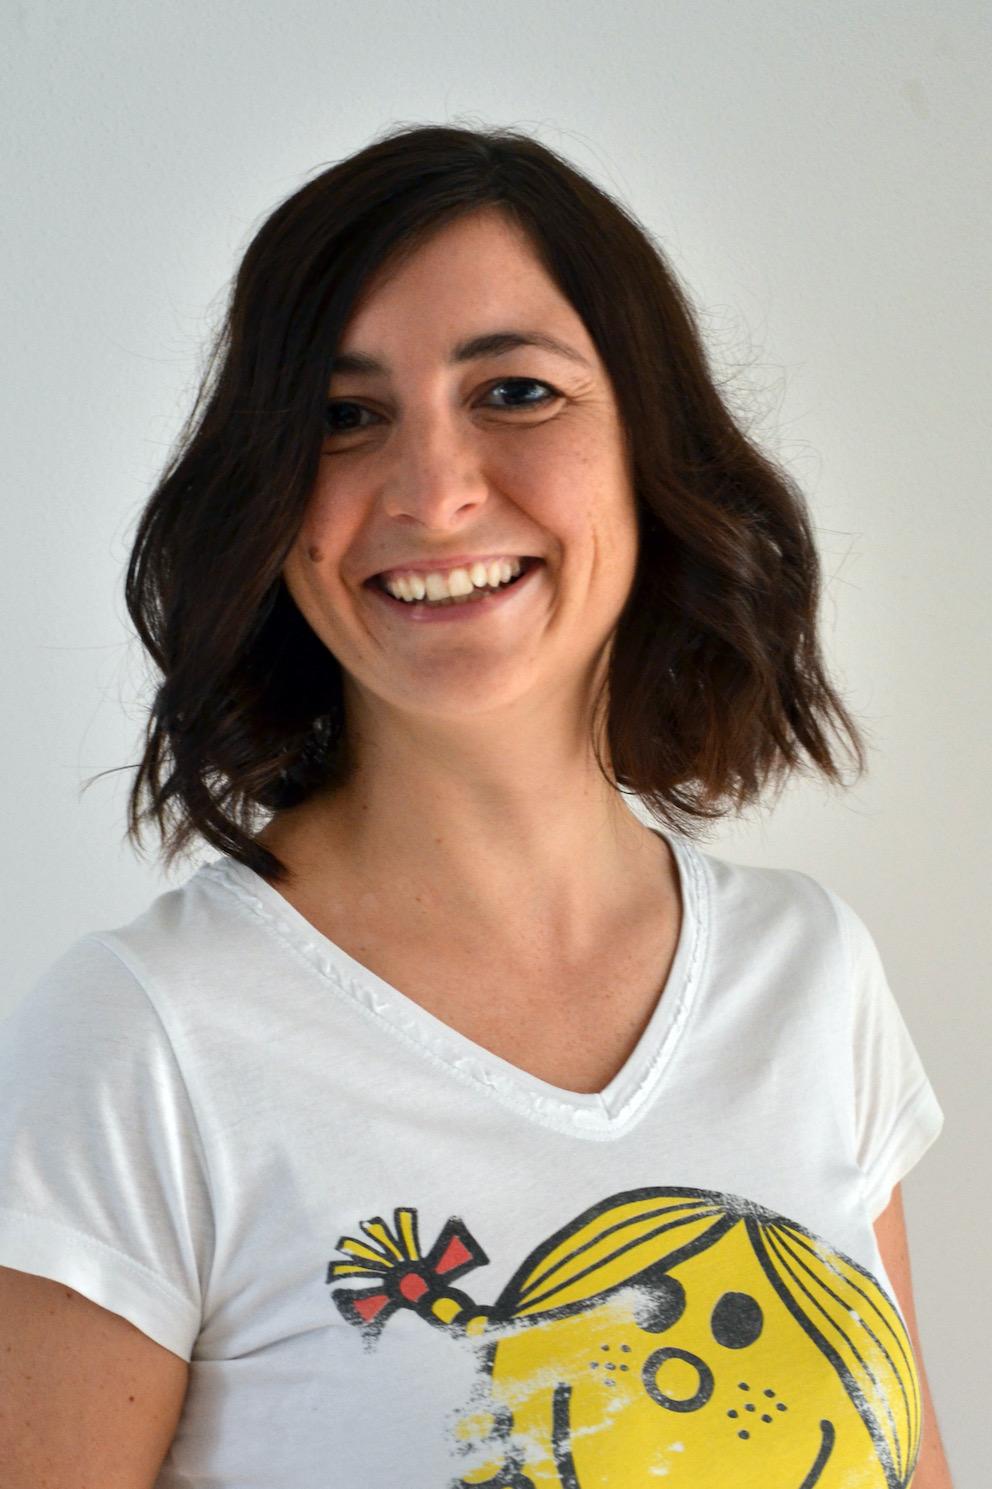 Lachyoga Trainerin Sandra Schmid Deggendorf